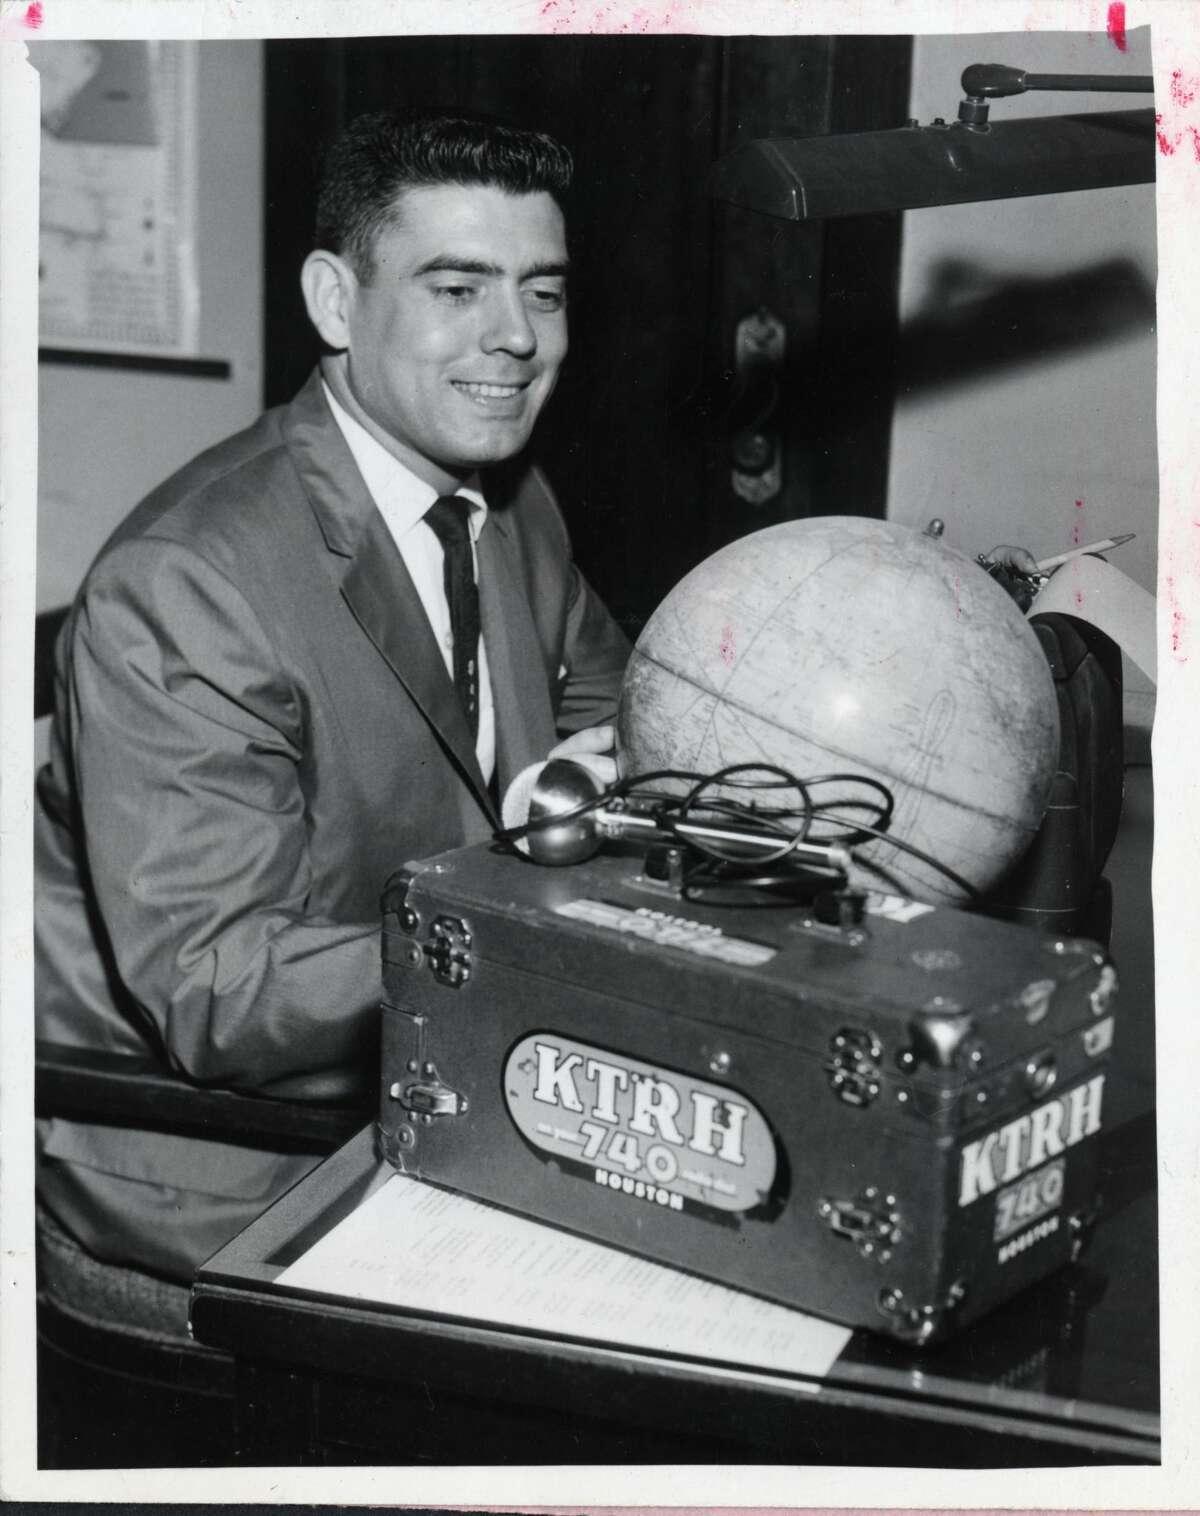 Dan Rather at KTRH in Houston, TX, Oct 13, 1957.